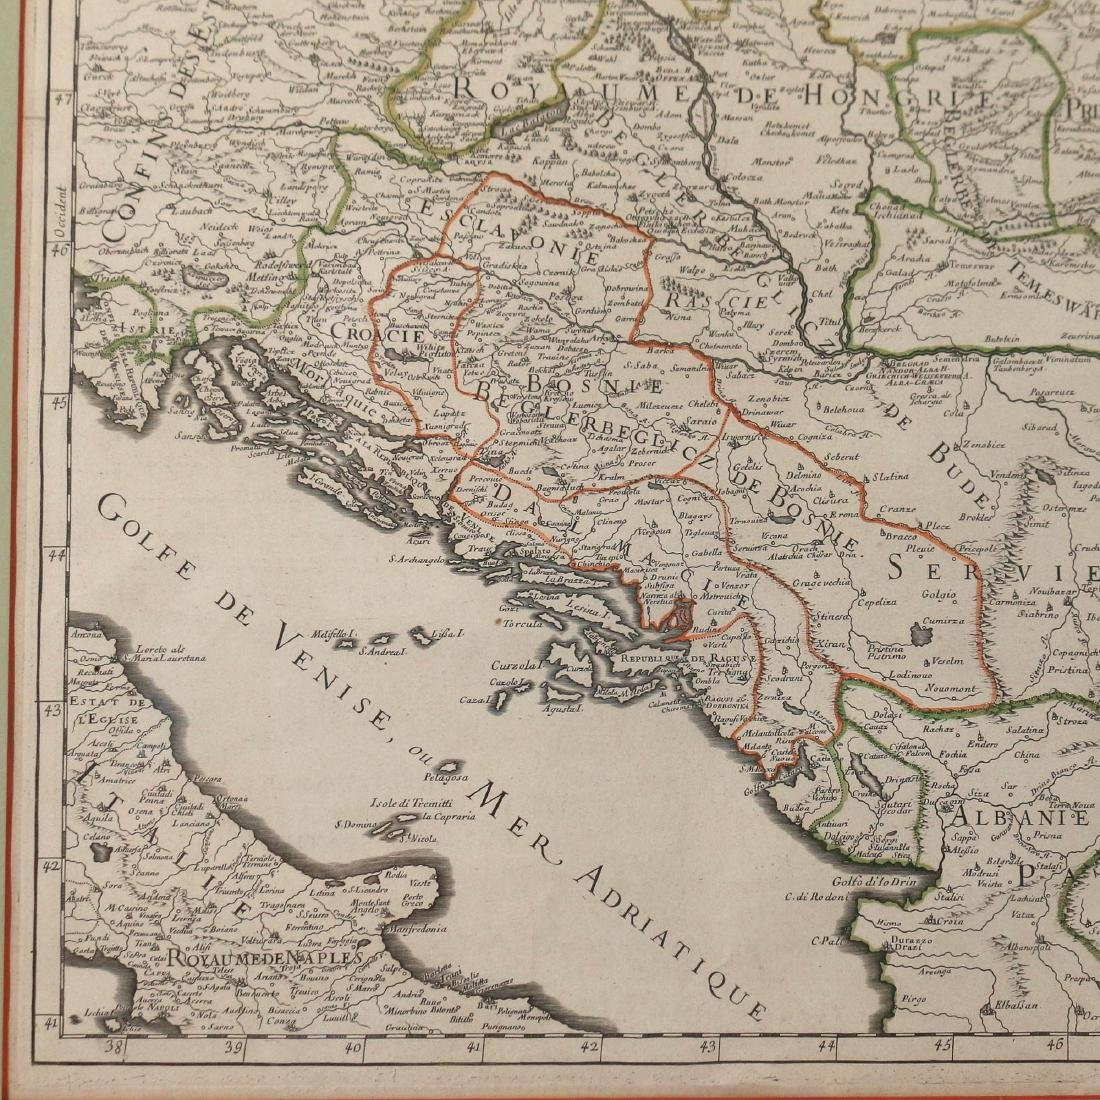 [JAILLOT] MAP OF HUNGARY & SURROUNDINGS - 6